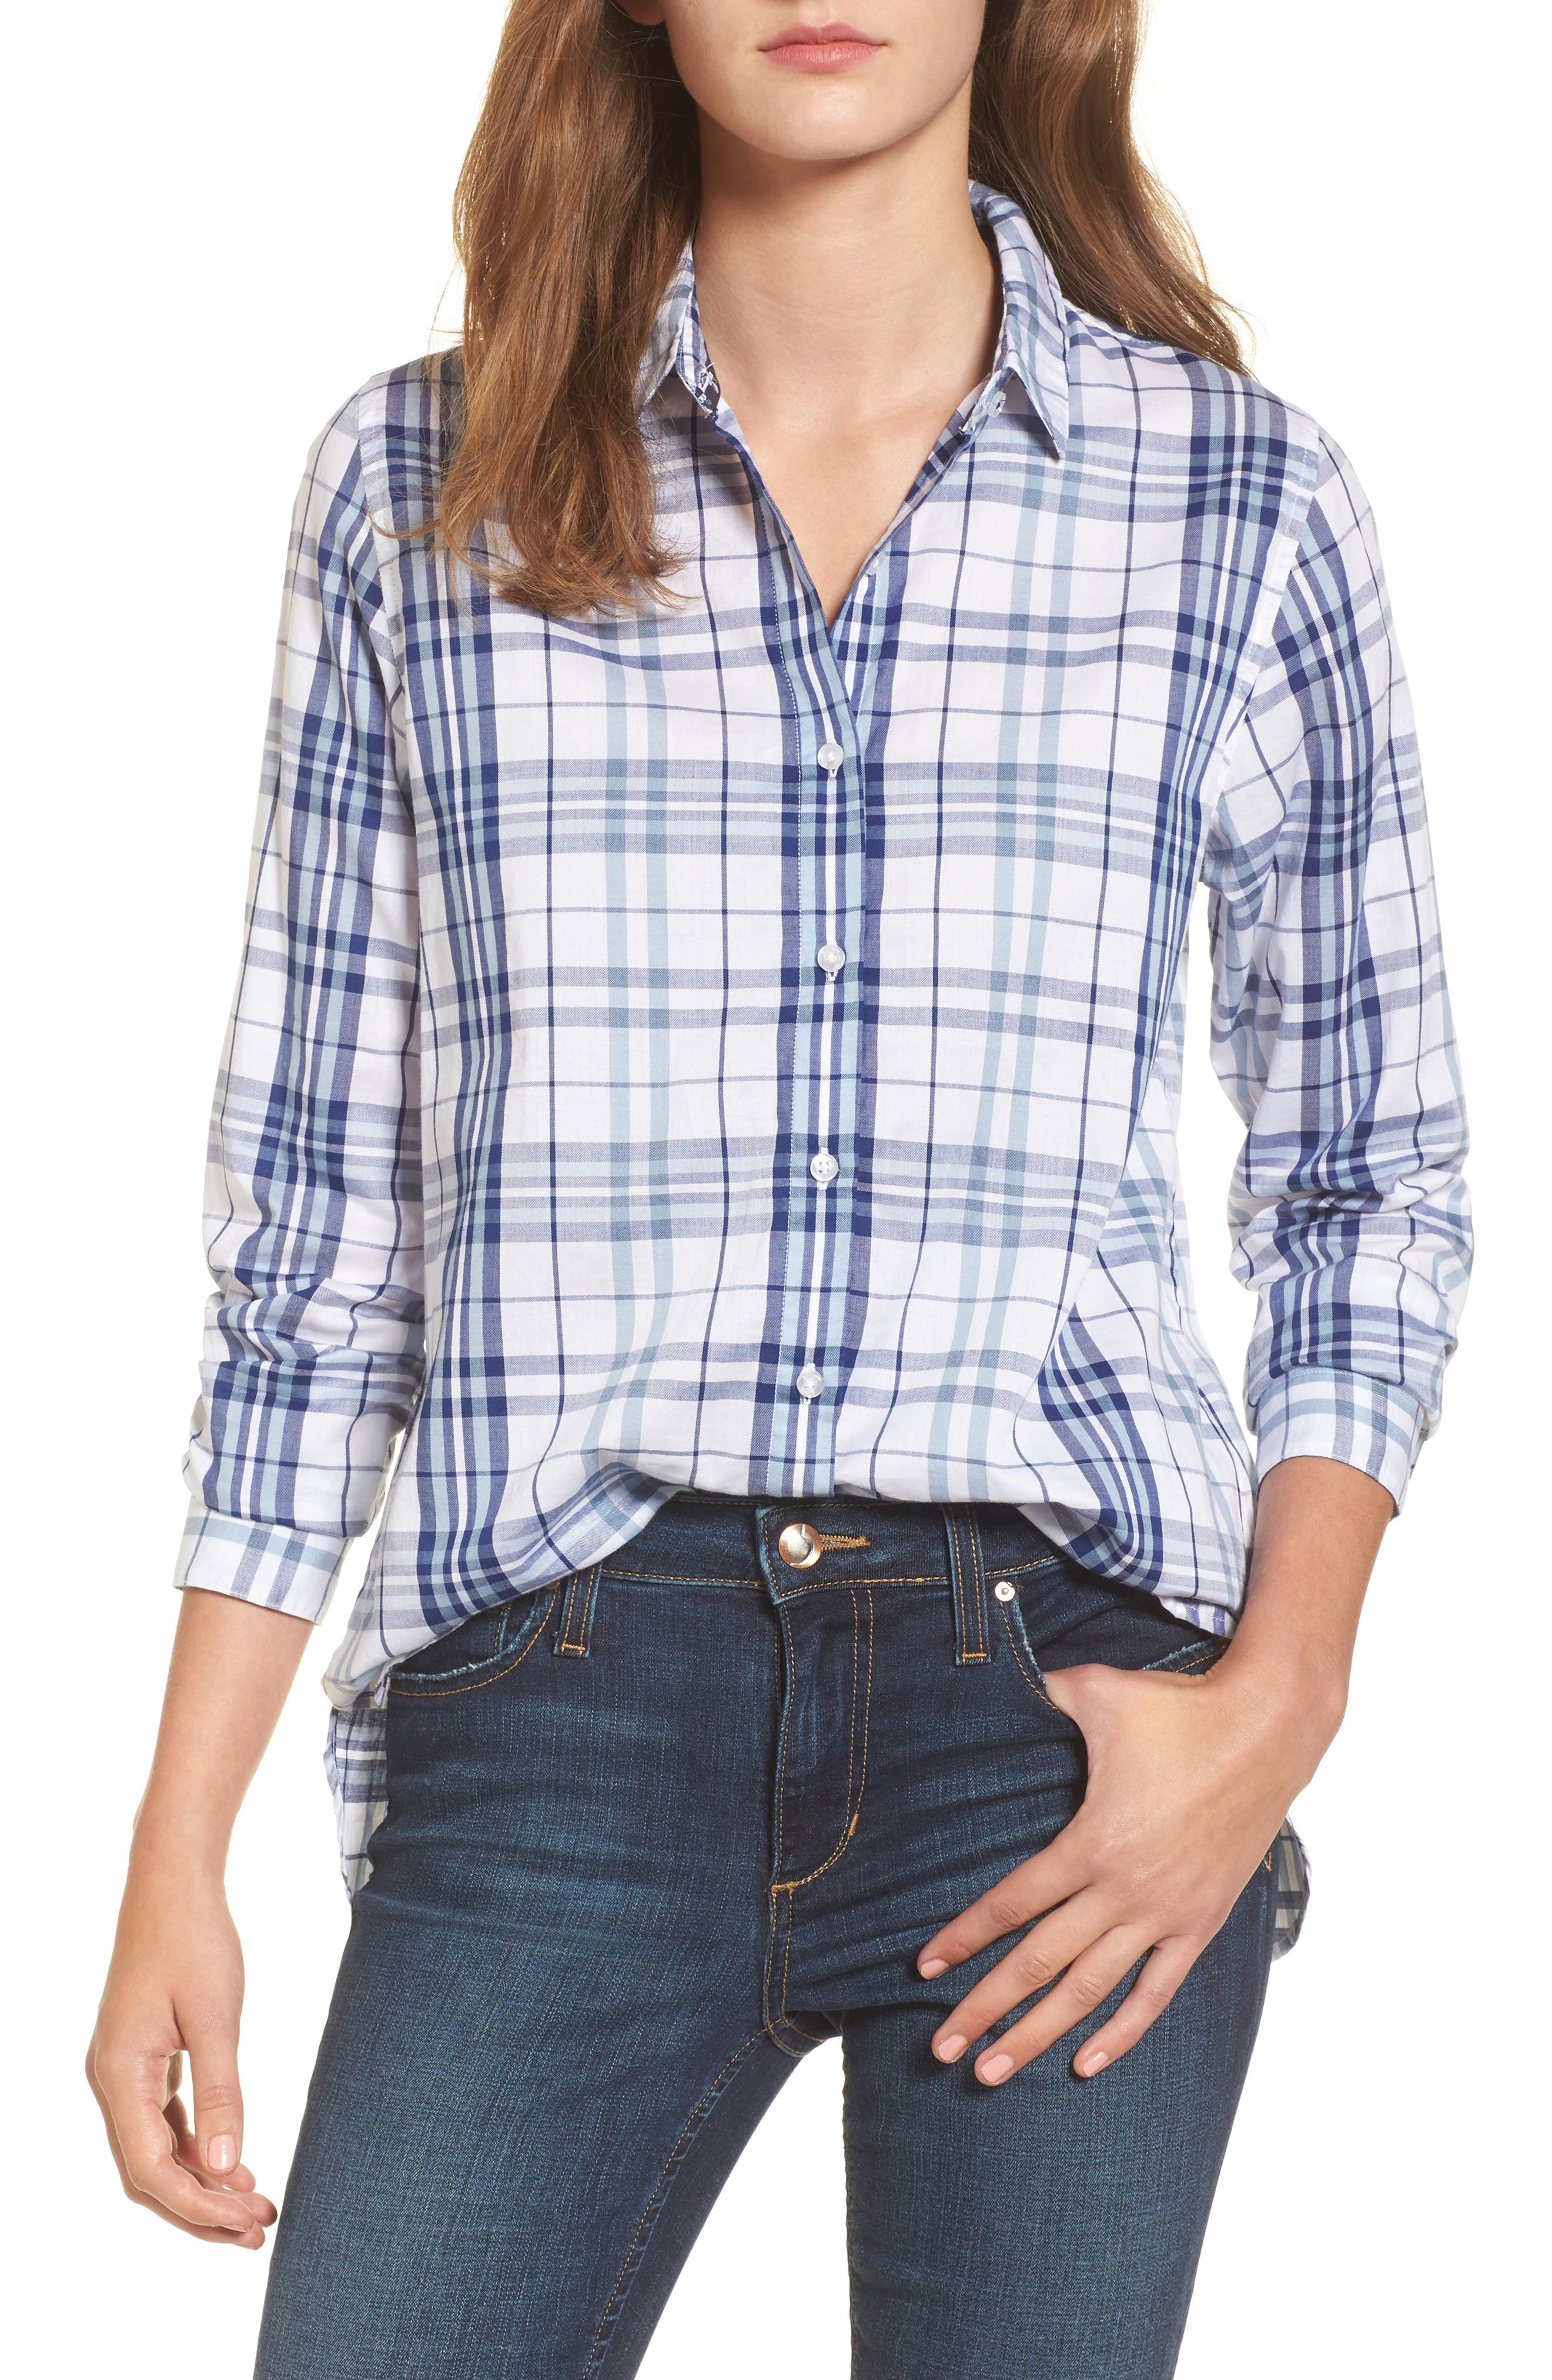 Selsey Plaid Shirt,                         Main,                         color, White/ Coastal Blue